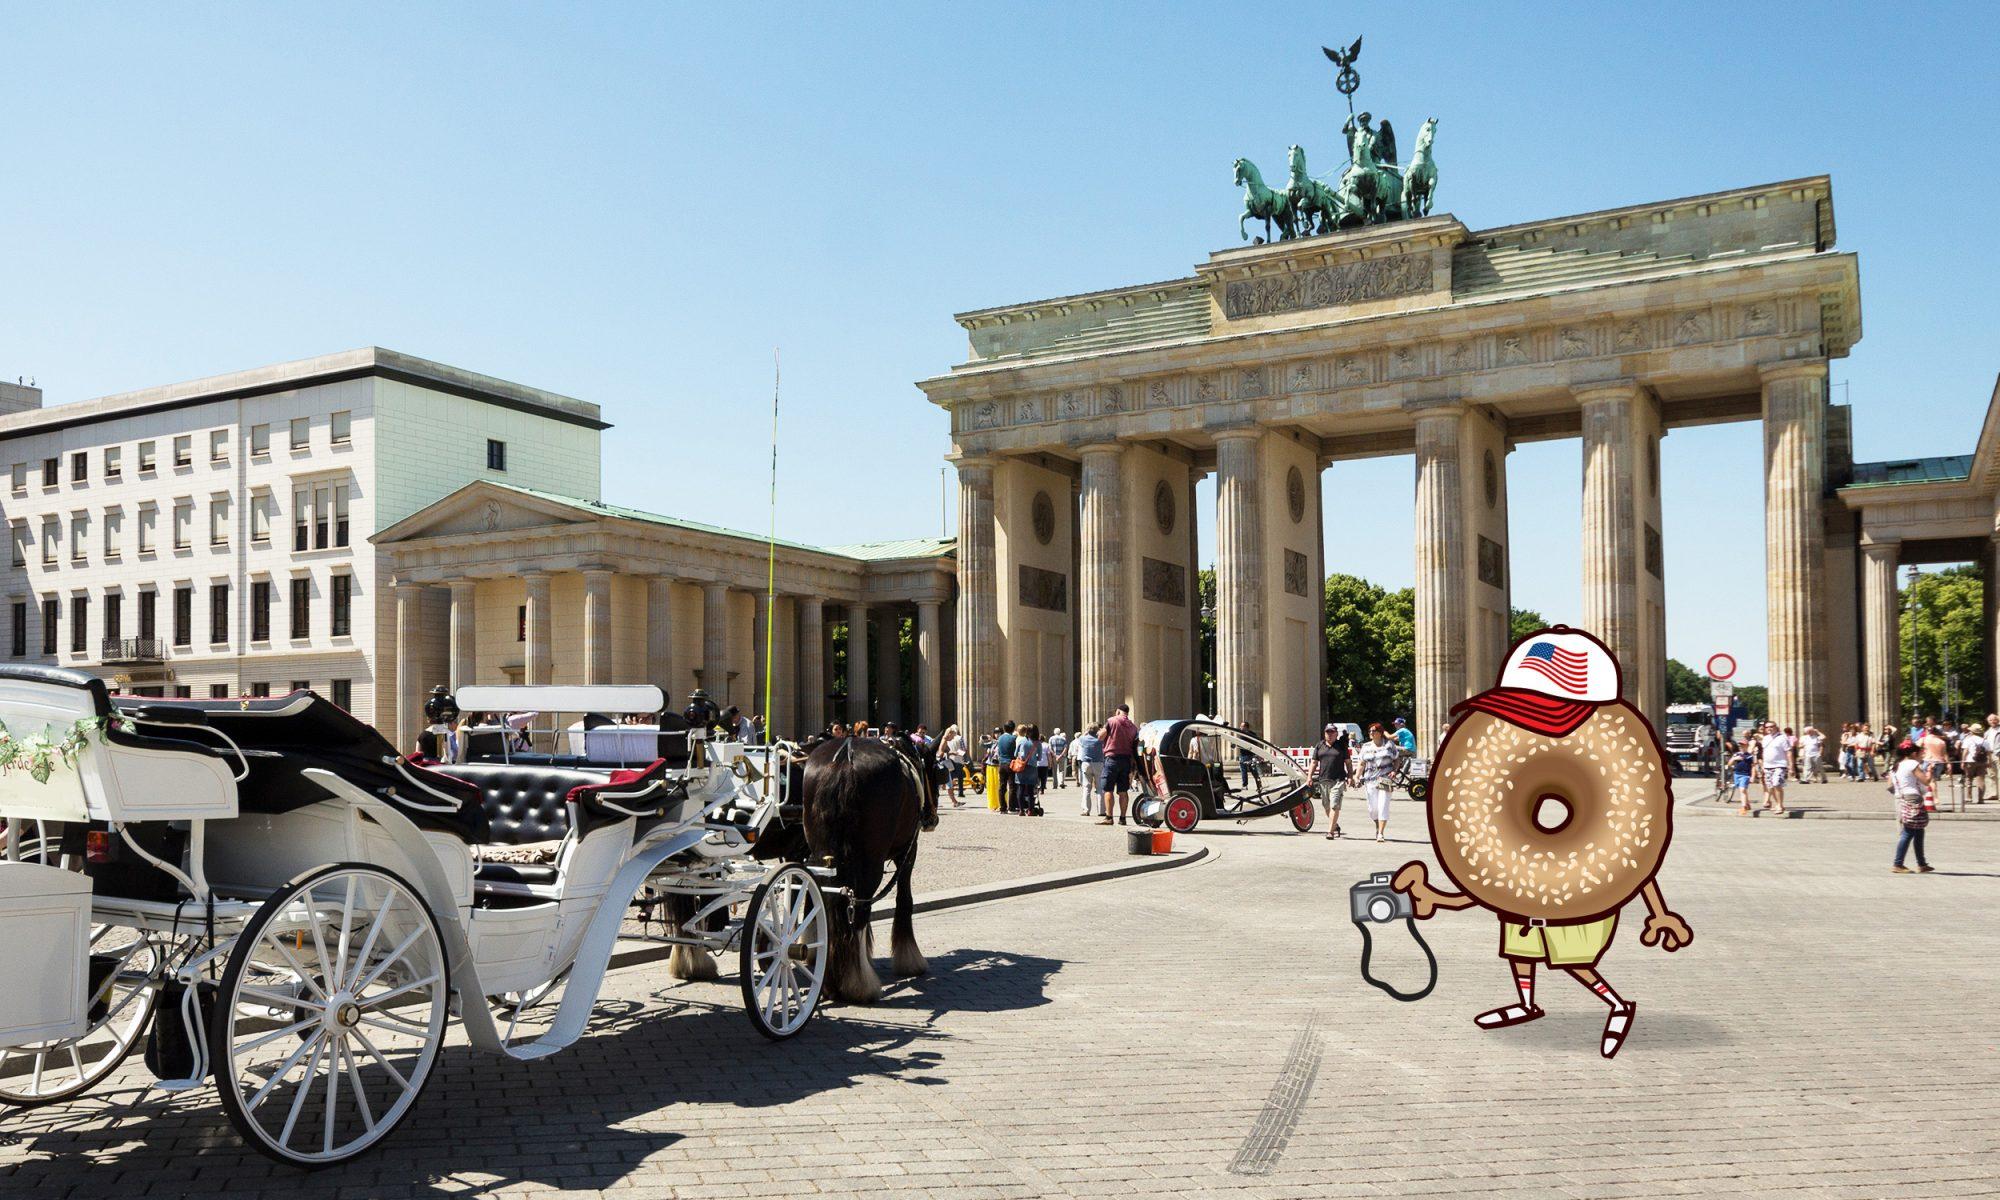 EC: The Best Bagels in Berlin Are the Only Bagels in Berlin